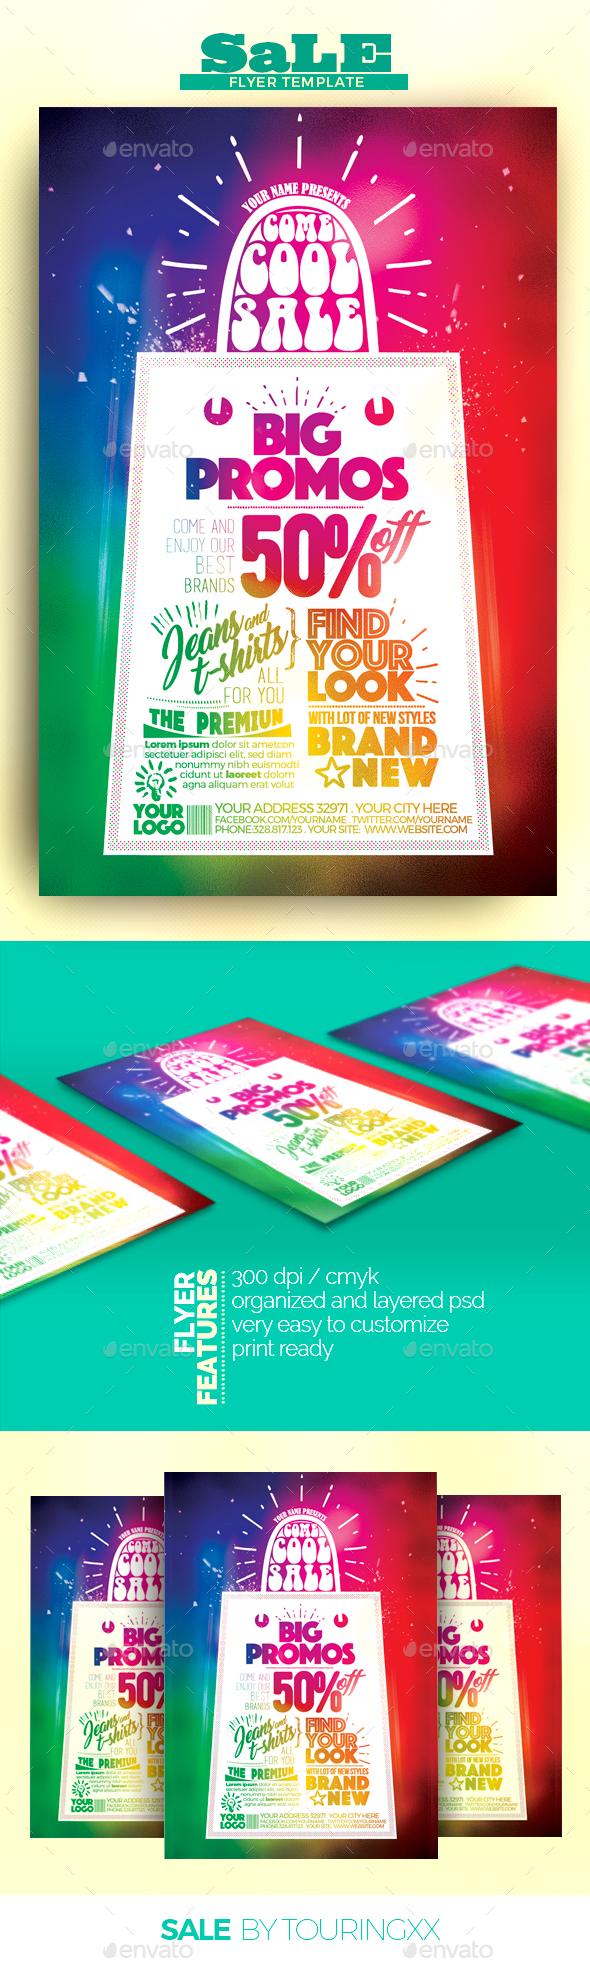 Sale Flyer Template - Flyers Print Templates